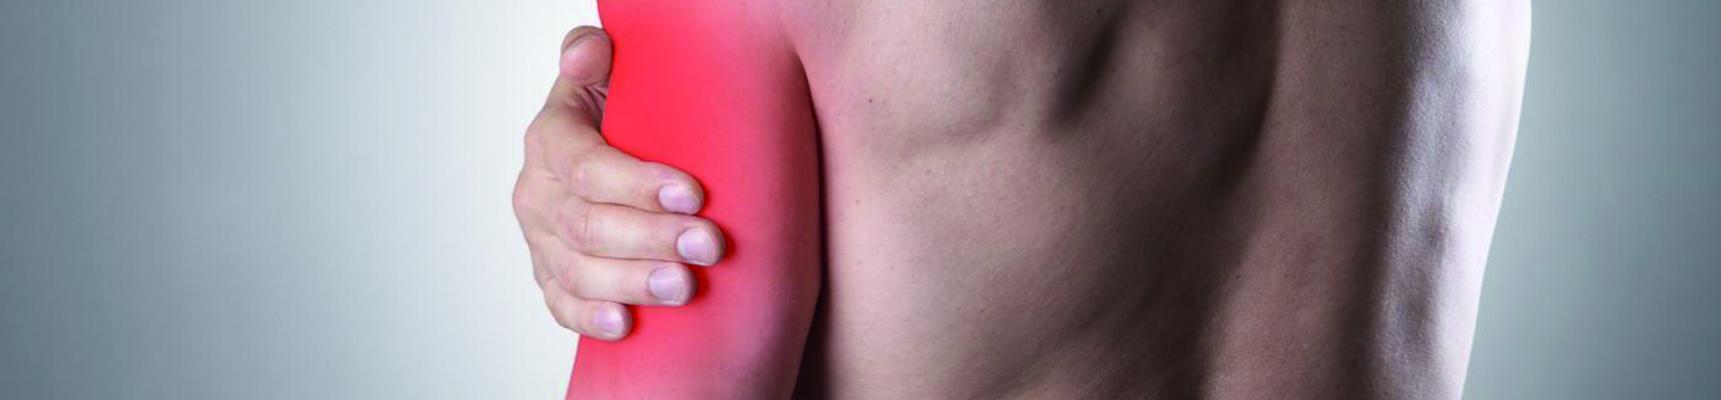 brazos con hormigueos o cansados osteopatia fisioclinics bilbao